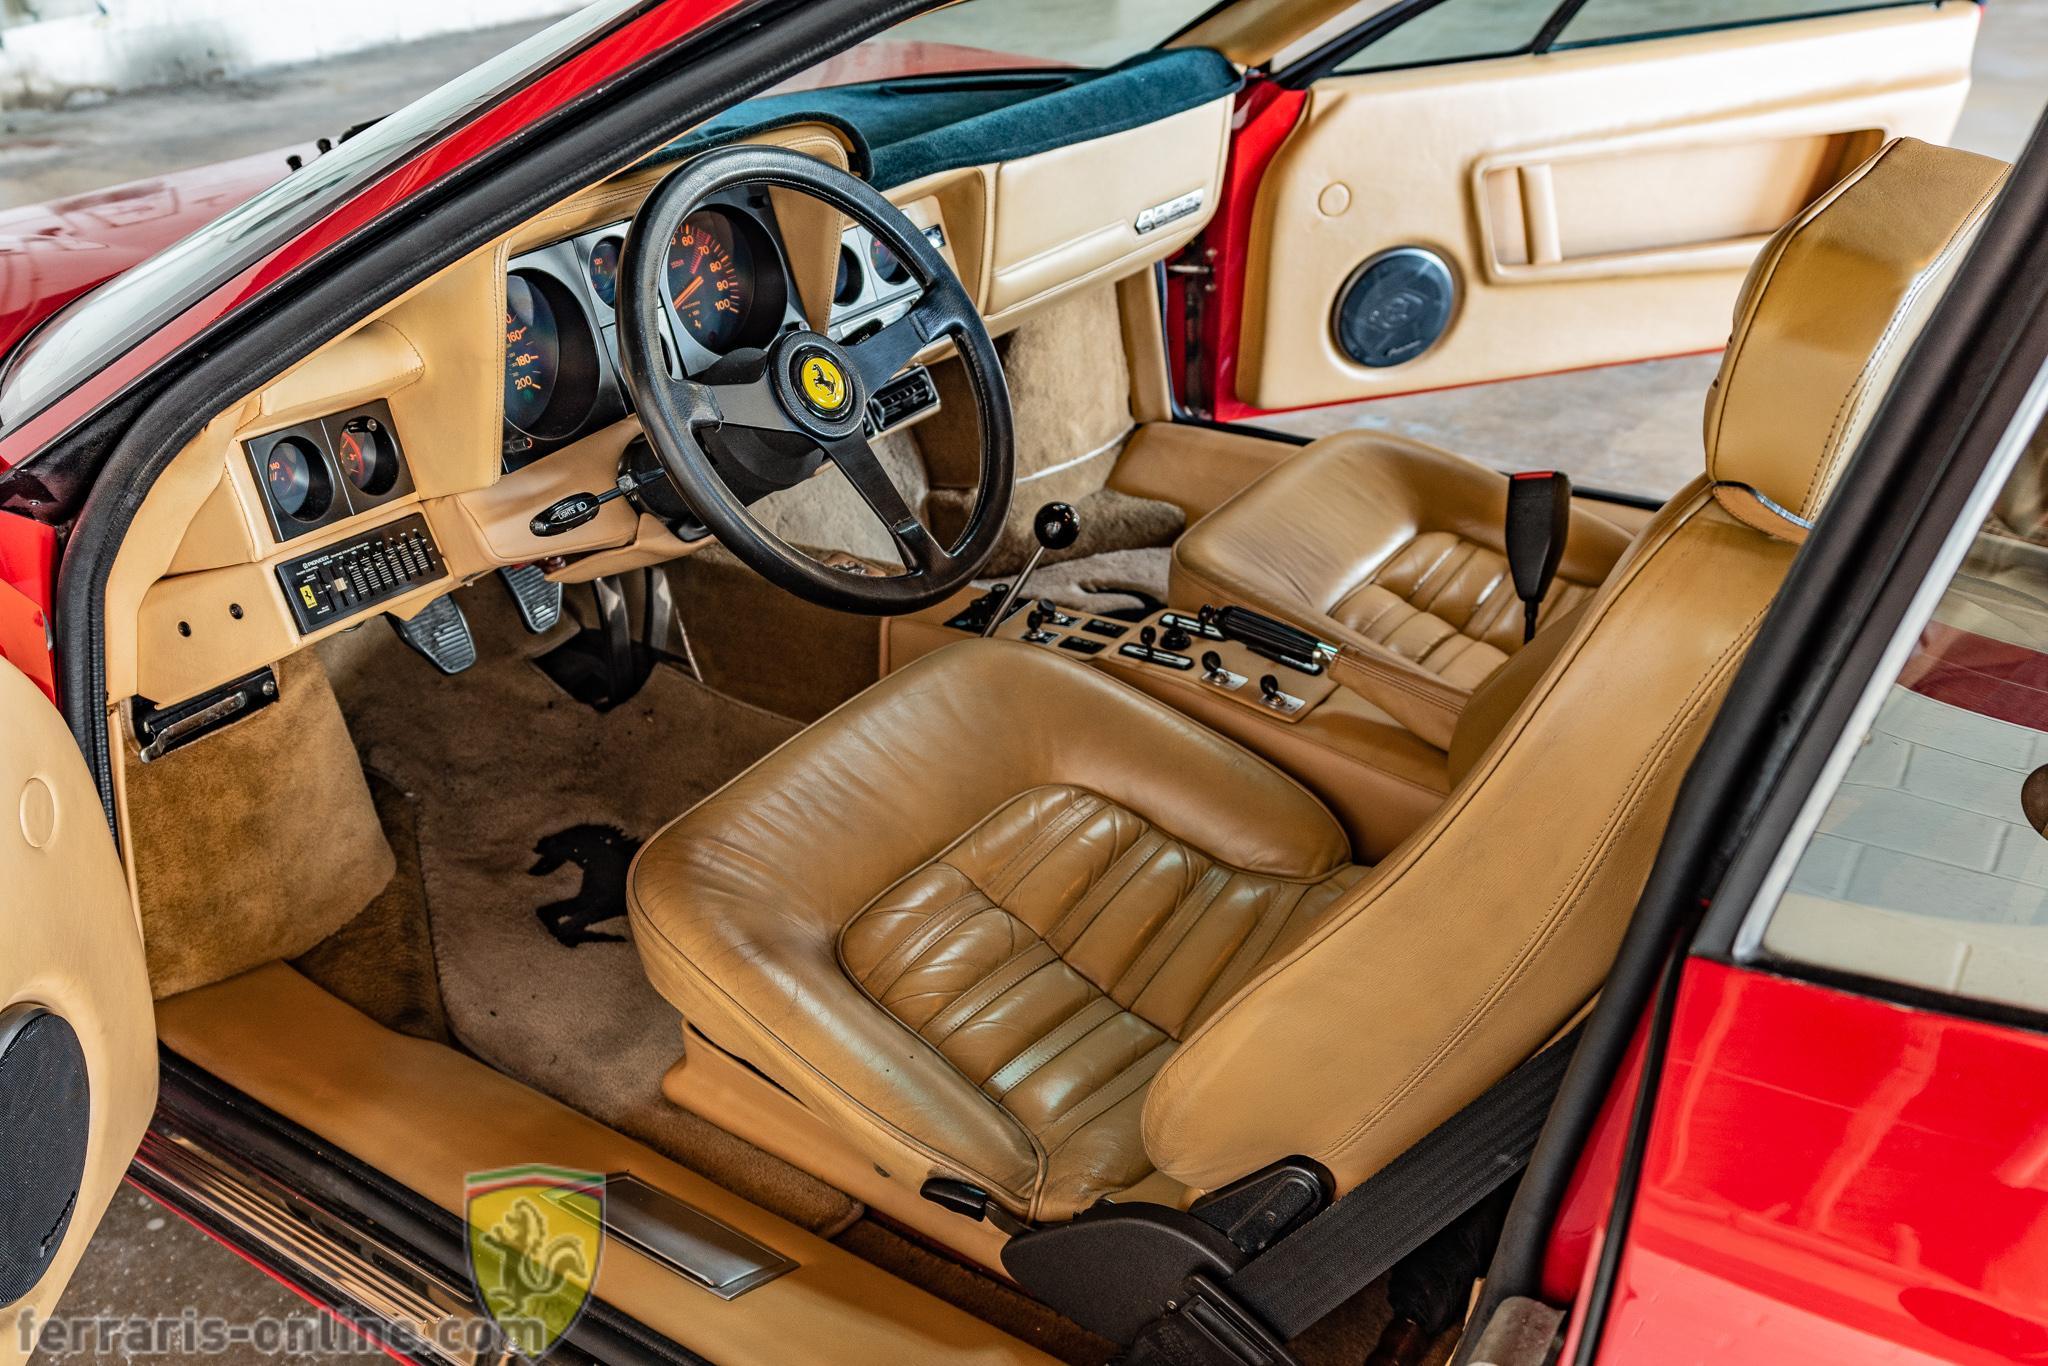 1984 Ferrari 512 BBi (Berlinetta Boxer) #51339